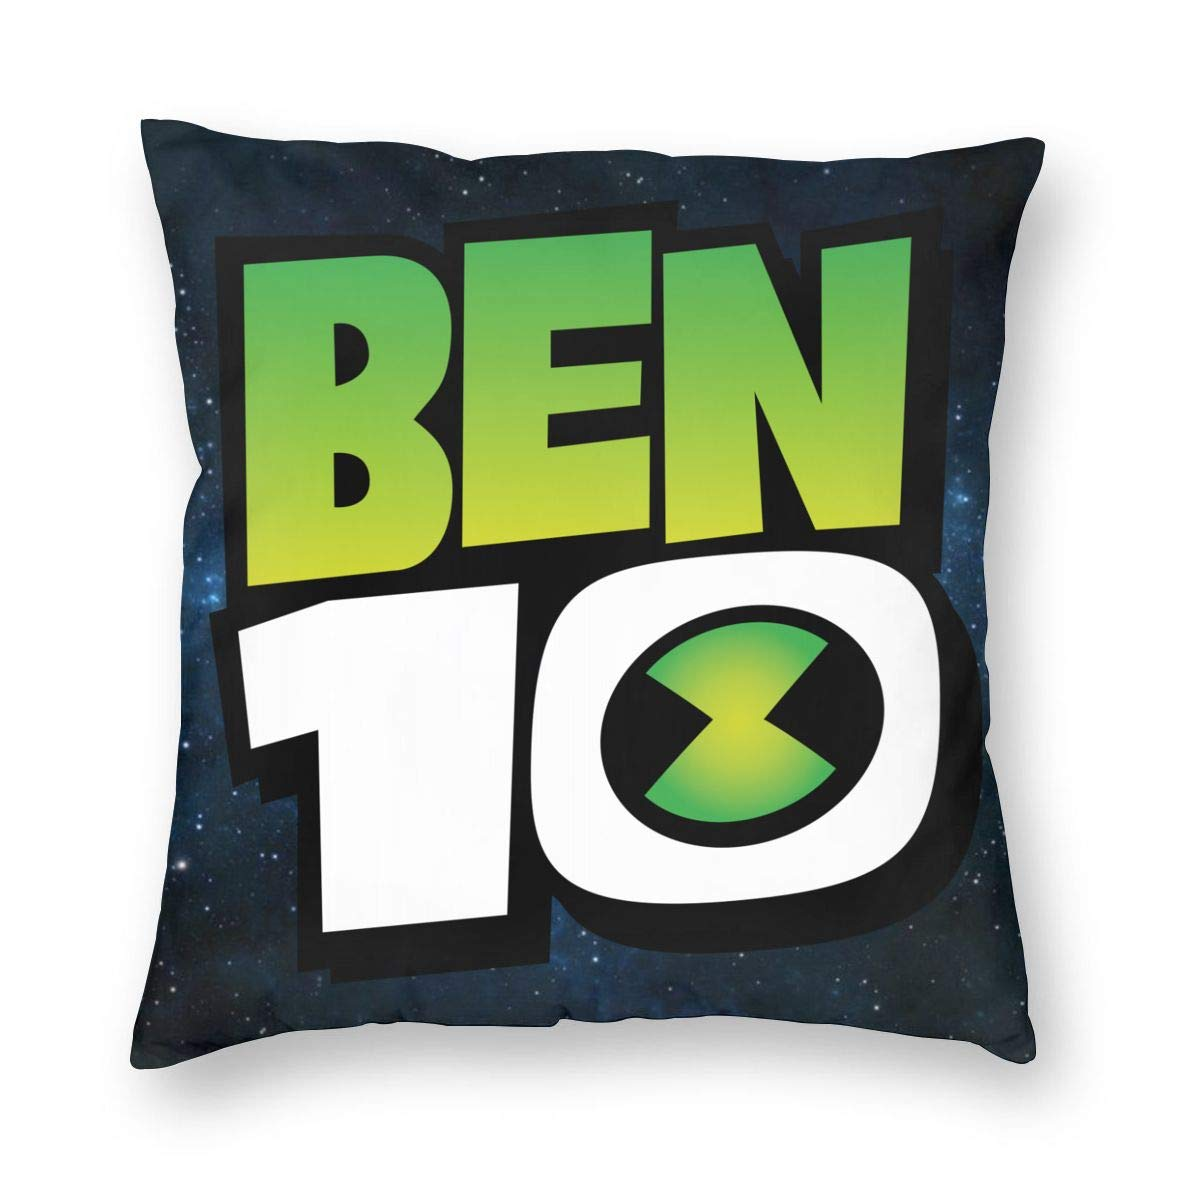 "Hey! May Ben-10 and Alien Hero Bedding Pillow Cases Ultra Soft Microfiber Pillowcase Set 22""x22"""